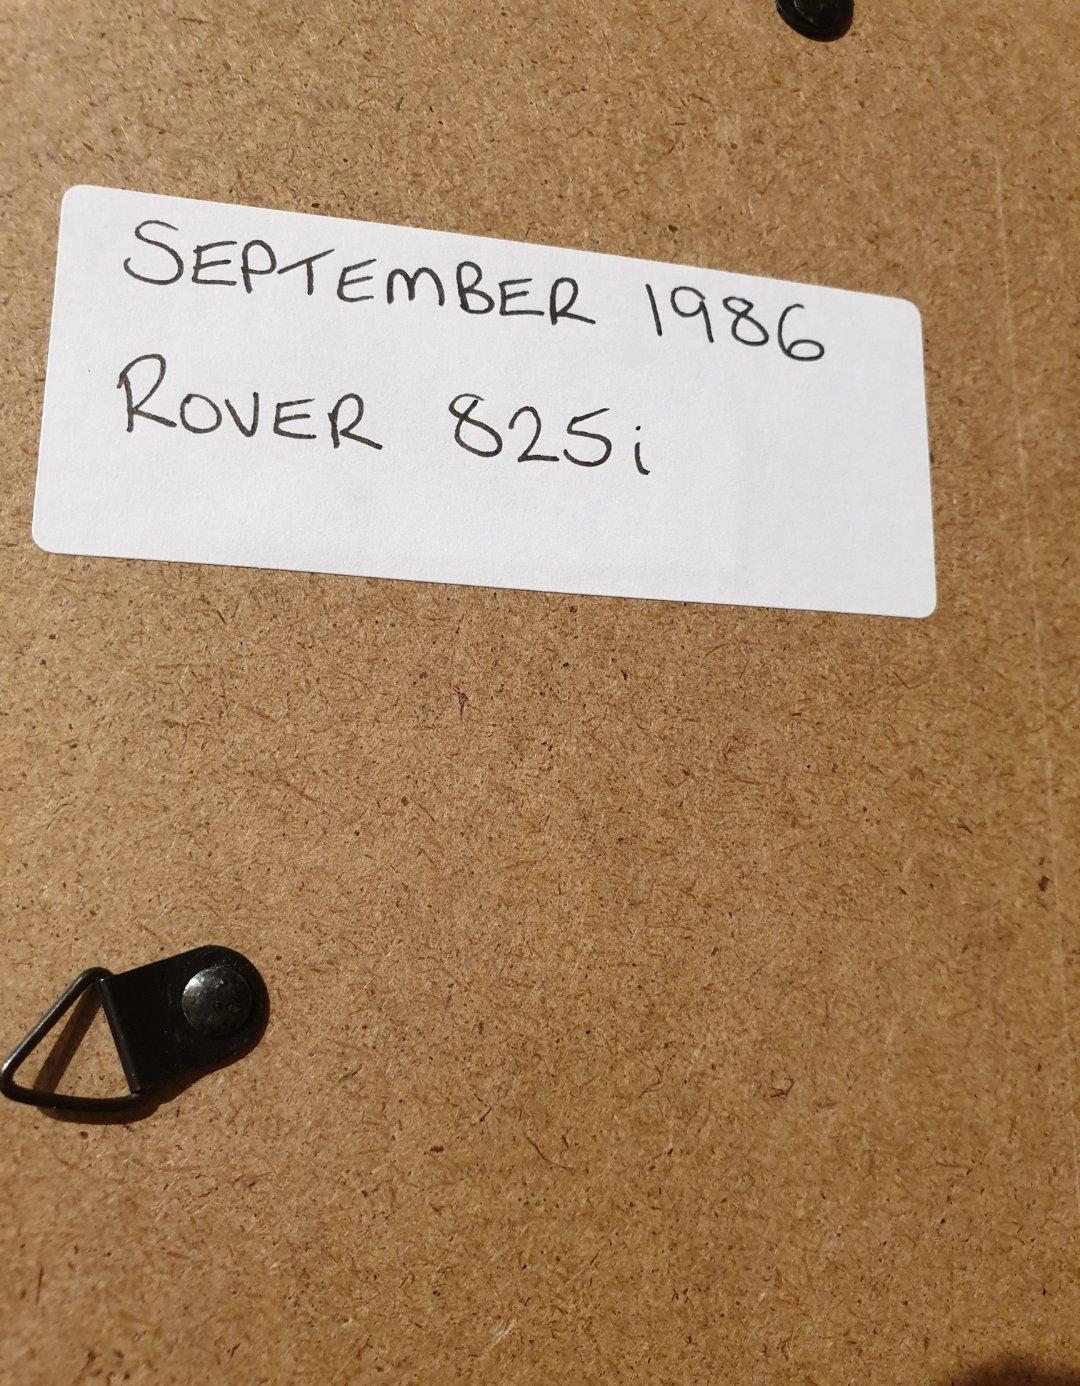 1986 Original Rover 825i Framed Advert For Sale (picture 2 of 2)